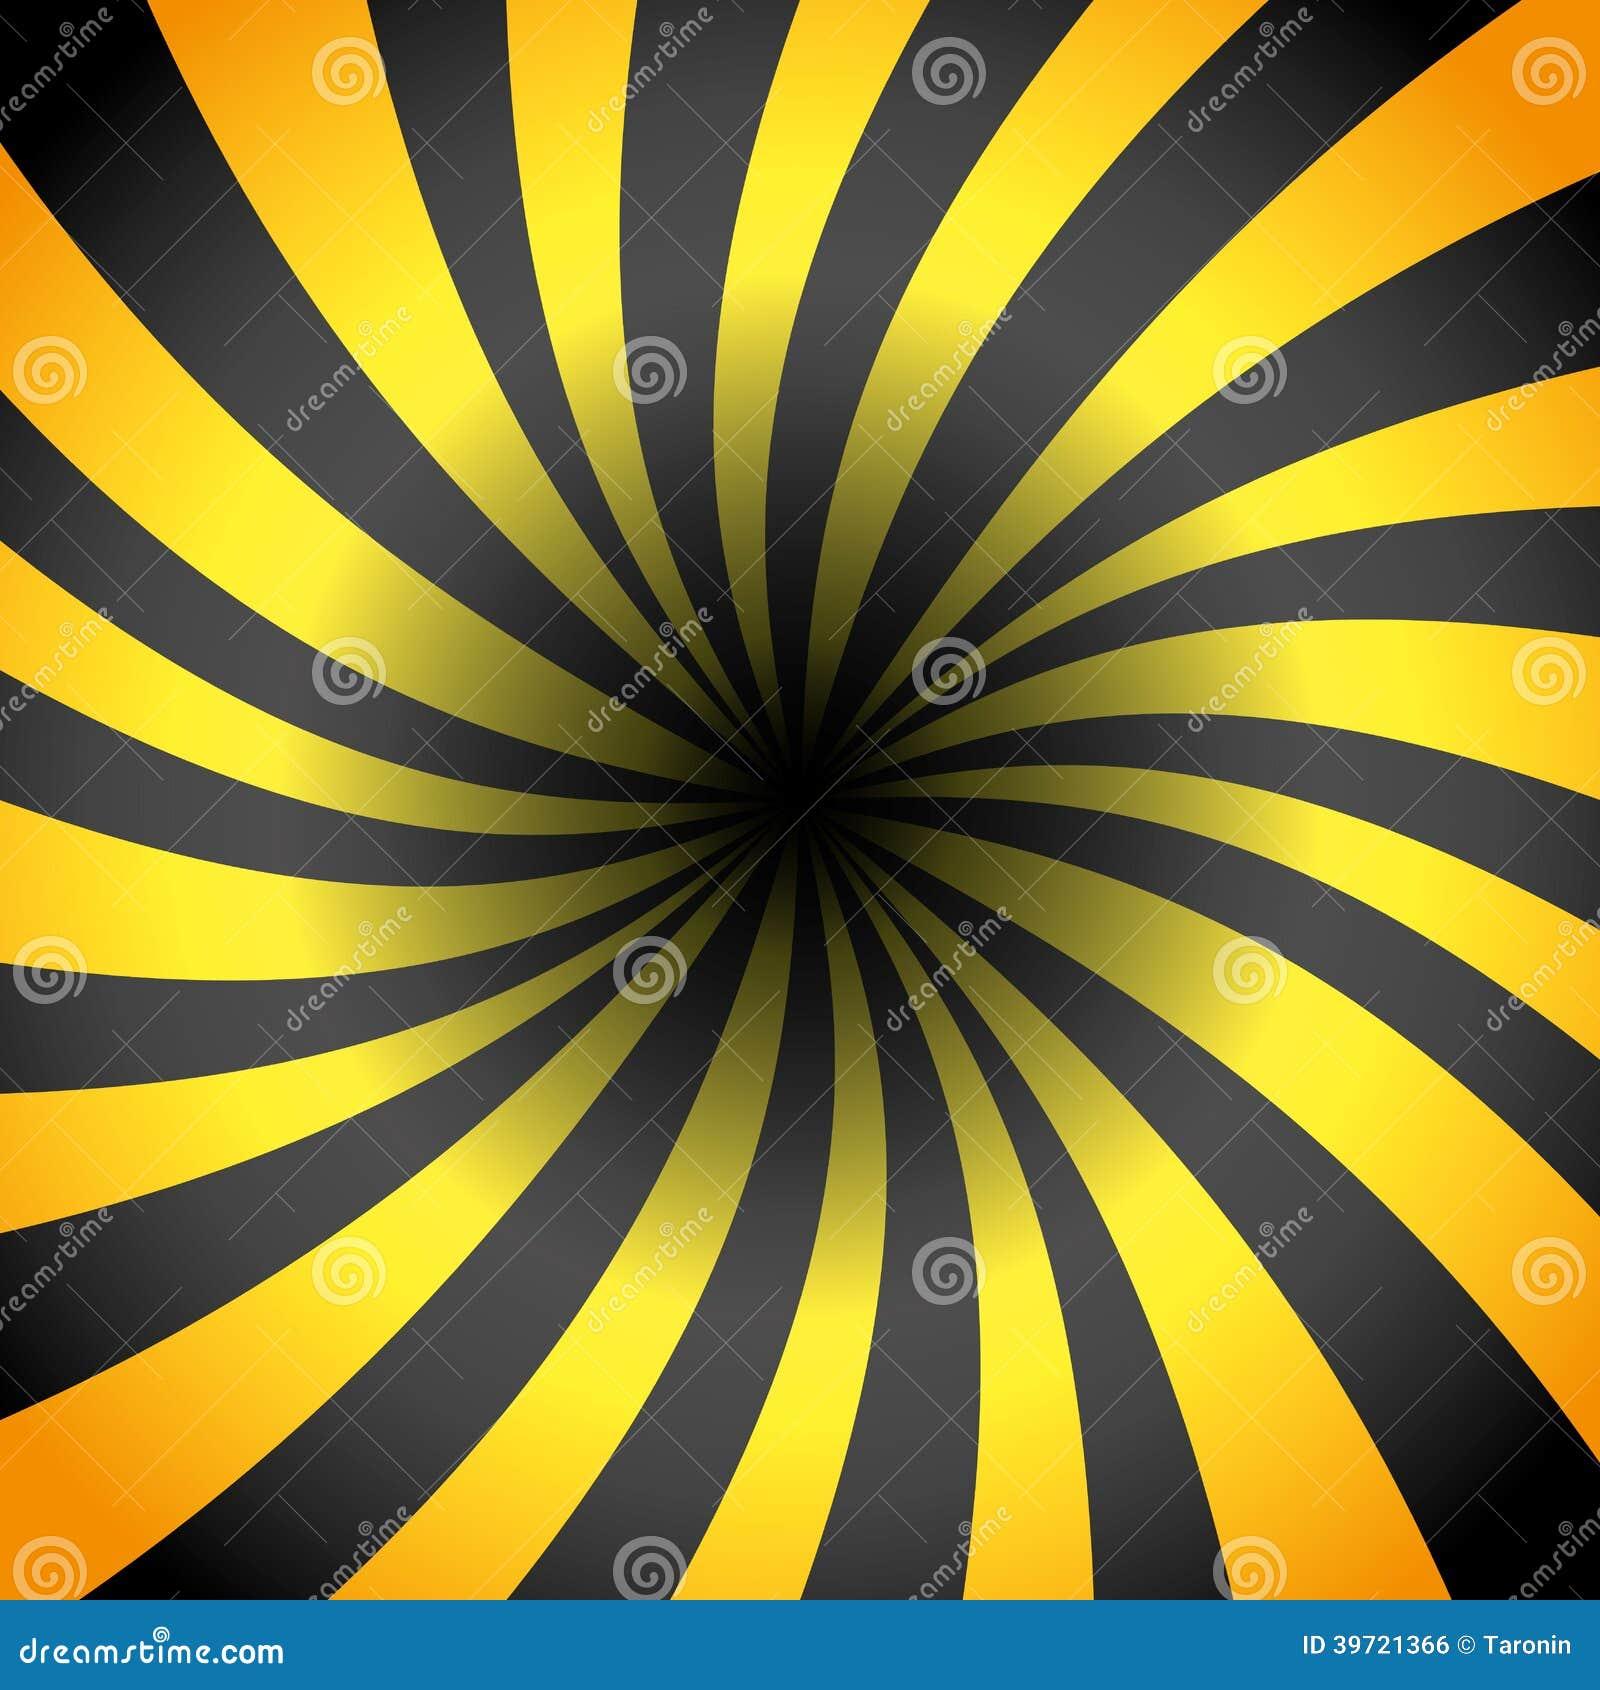 yellow rays vector - photo #29